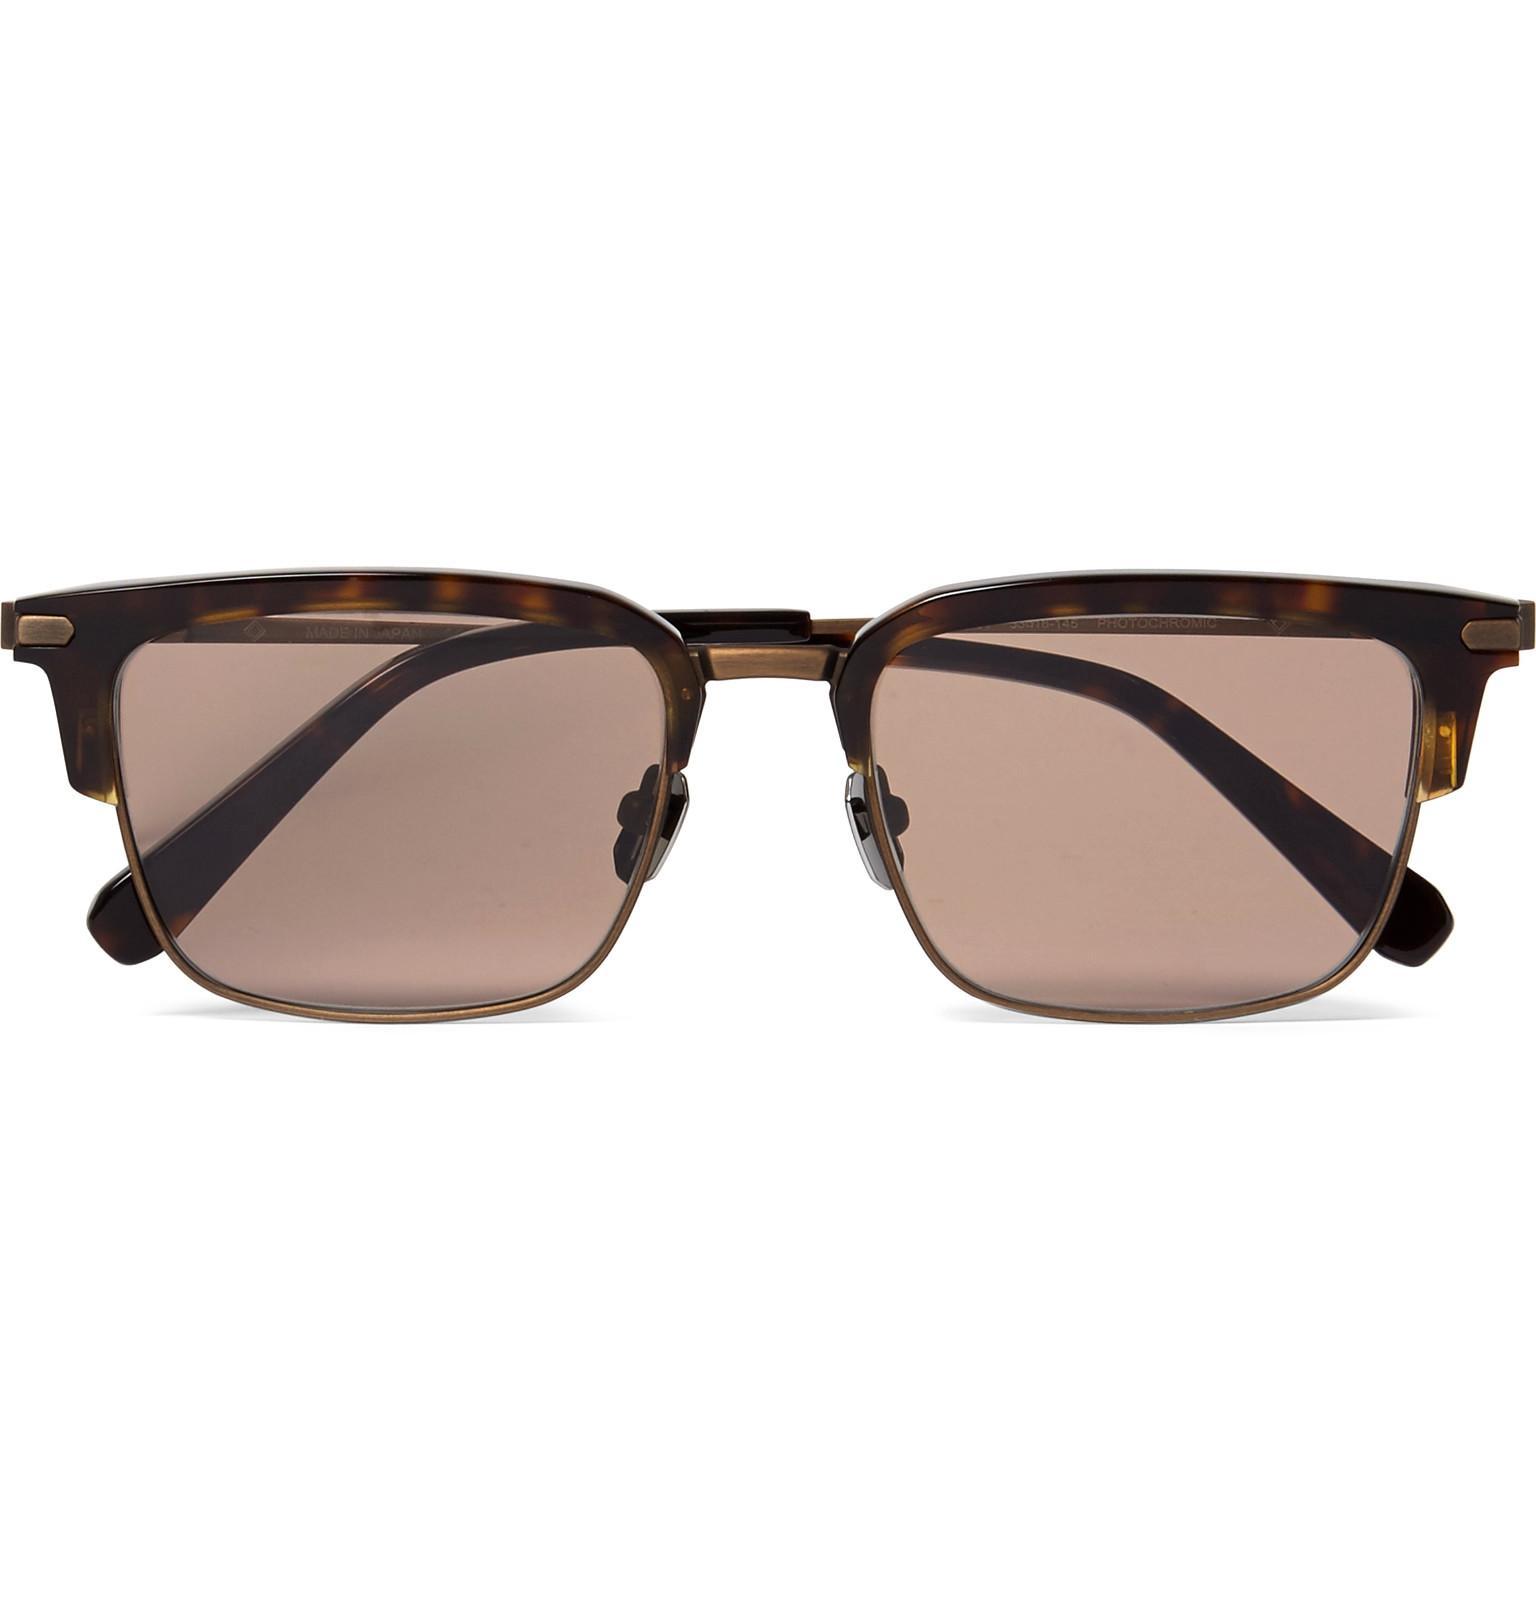 BRIONI D-frame Tortoiseshell Acetate And Gunmetal-tone Sunglasses - Tortoiseshell HEl9hMvZet